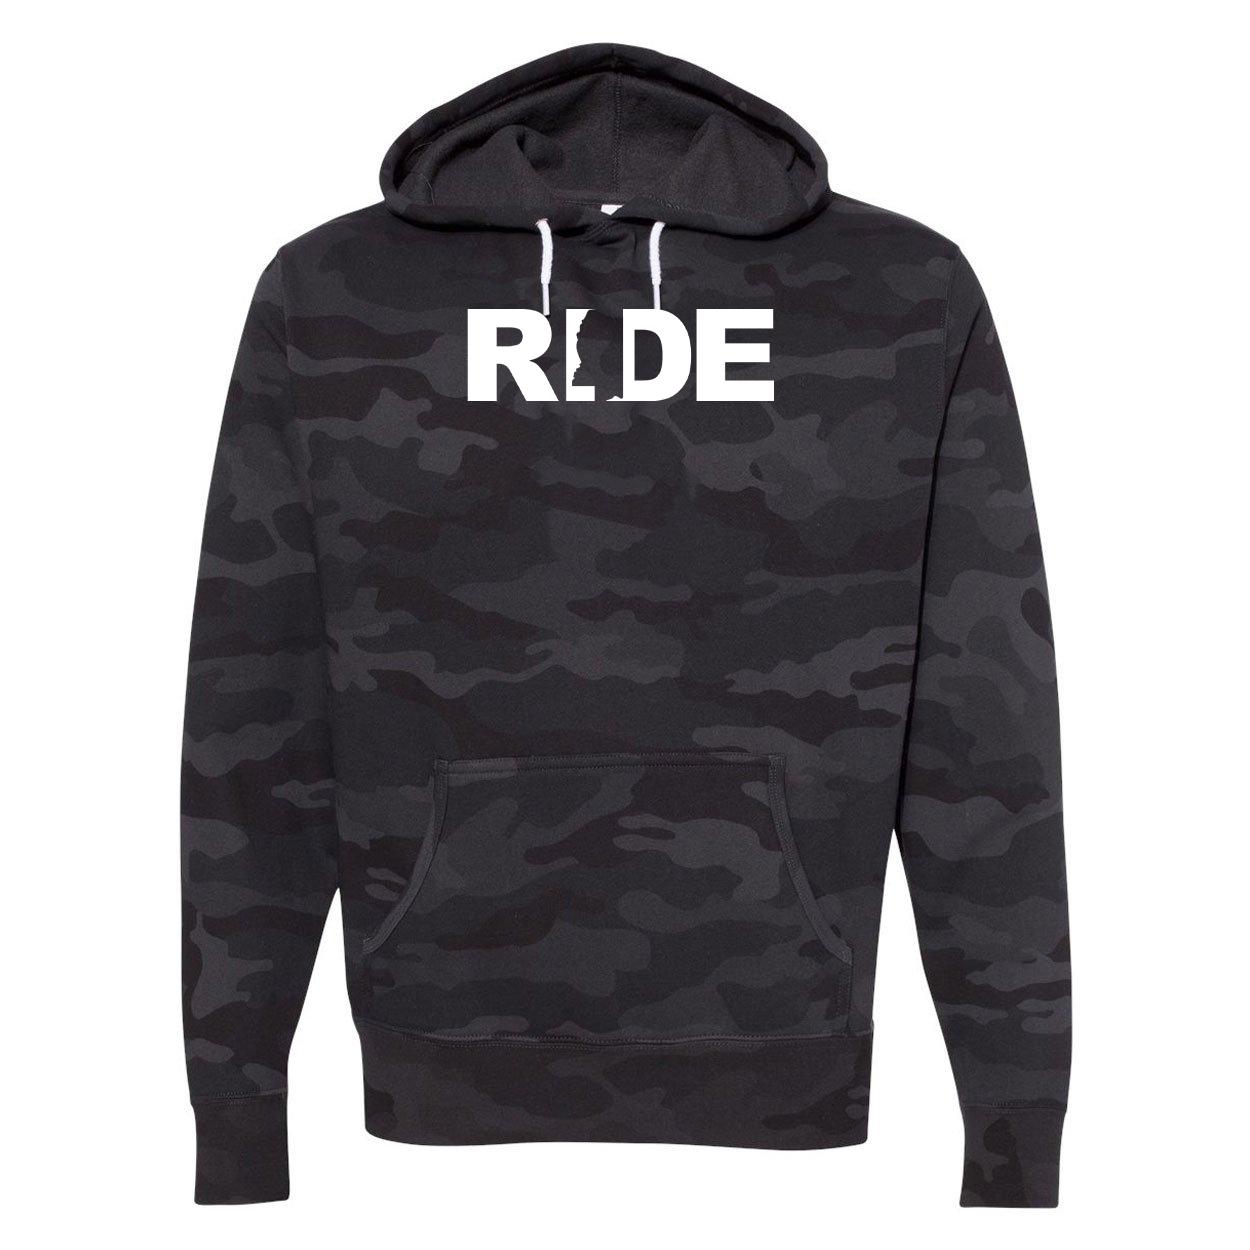 Ride Mississippi Classic Unisex Hooded Sweatshirt Black Camo (White Logo)